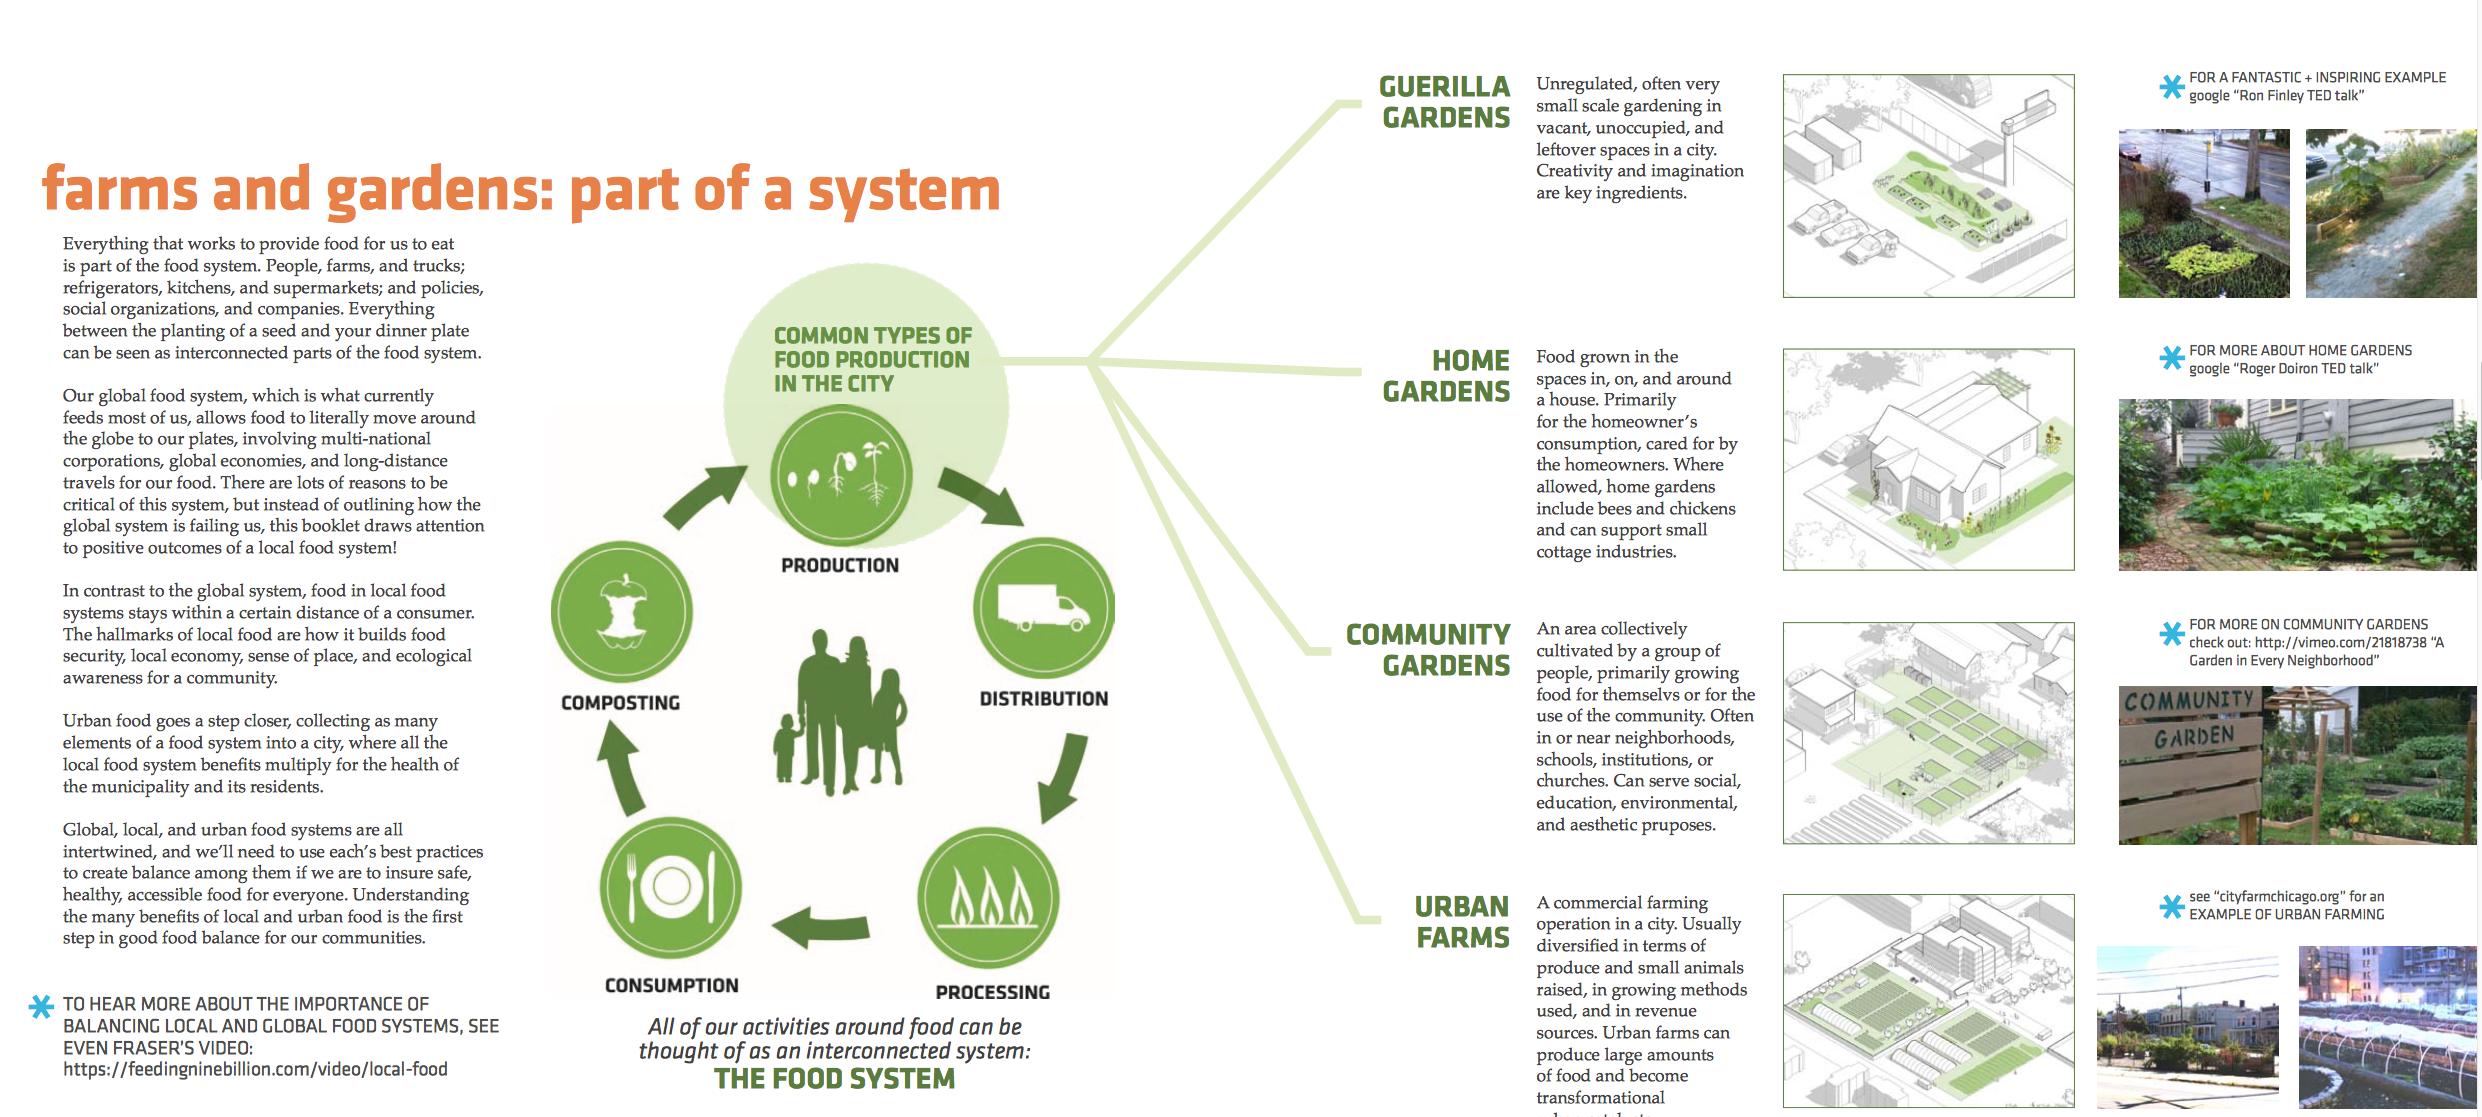 9006f418d9efa7a010166800b3f3b3ea - What Is The Importance Of Urban Gardening